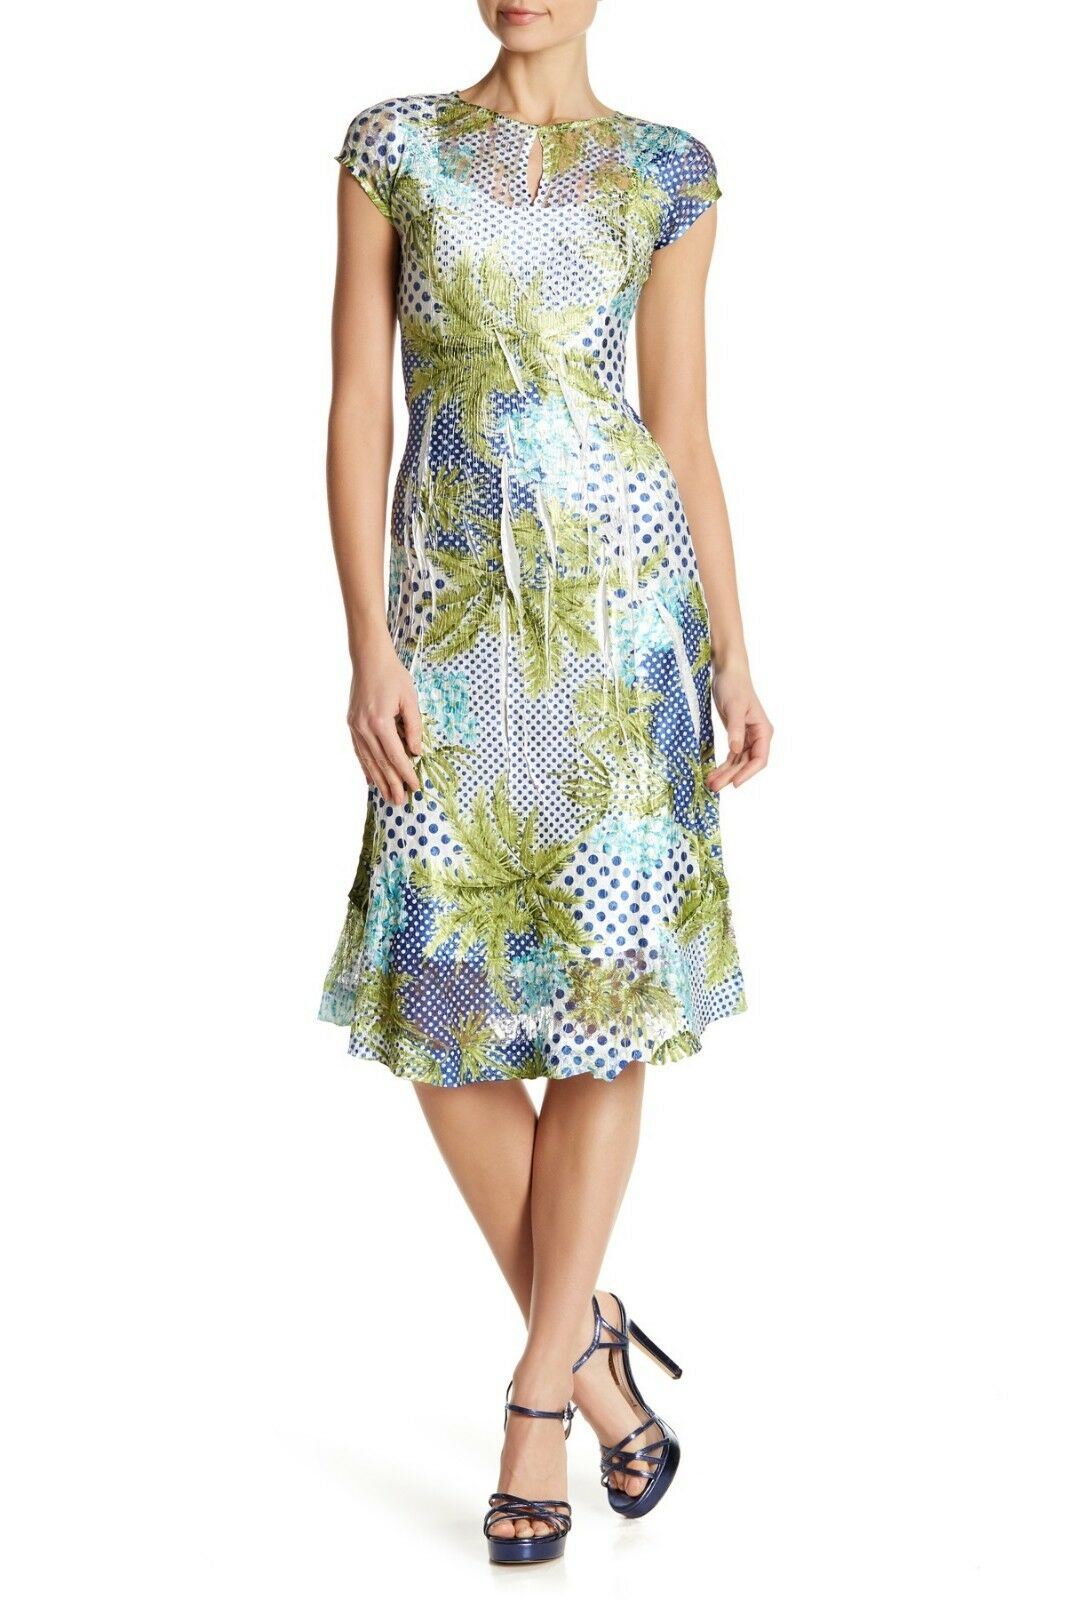 KOMAROV Cap Sleeve Keyhole Fit & Flare Dress, Jewel neck, Large, , NWT